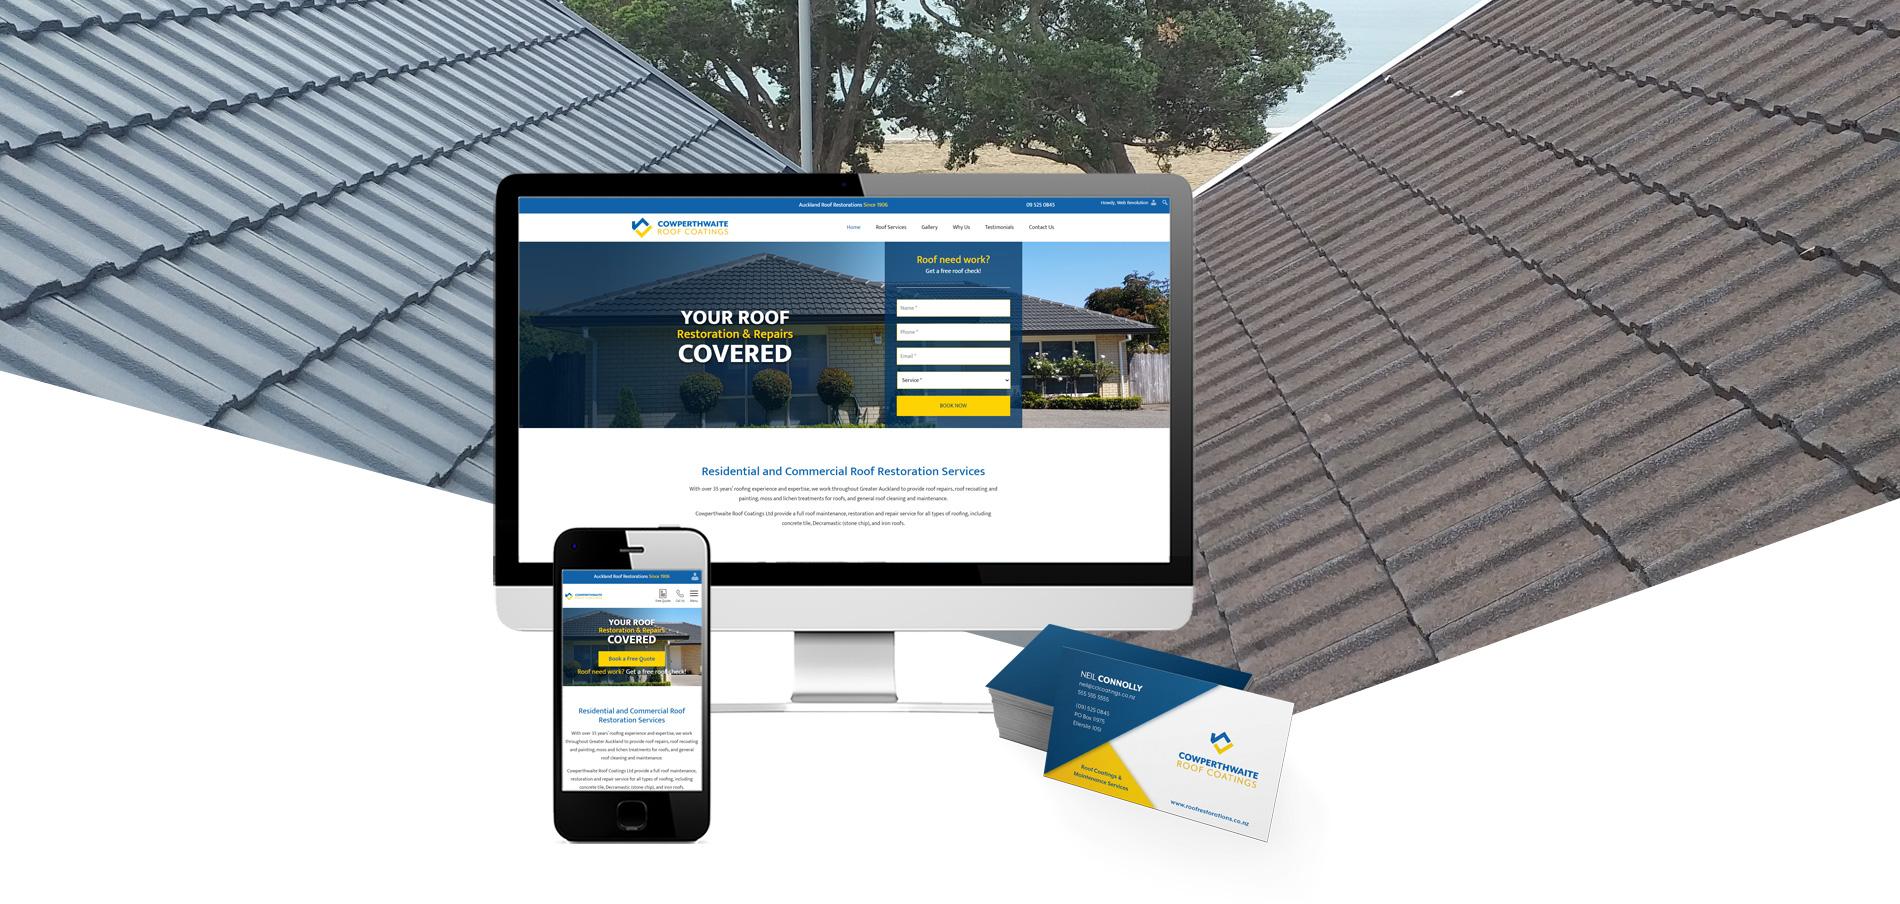 Cowperthwaite website and logo design Project Banner - Cowperthwaite Roof Coatings Website and logo design